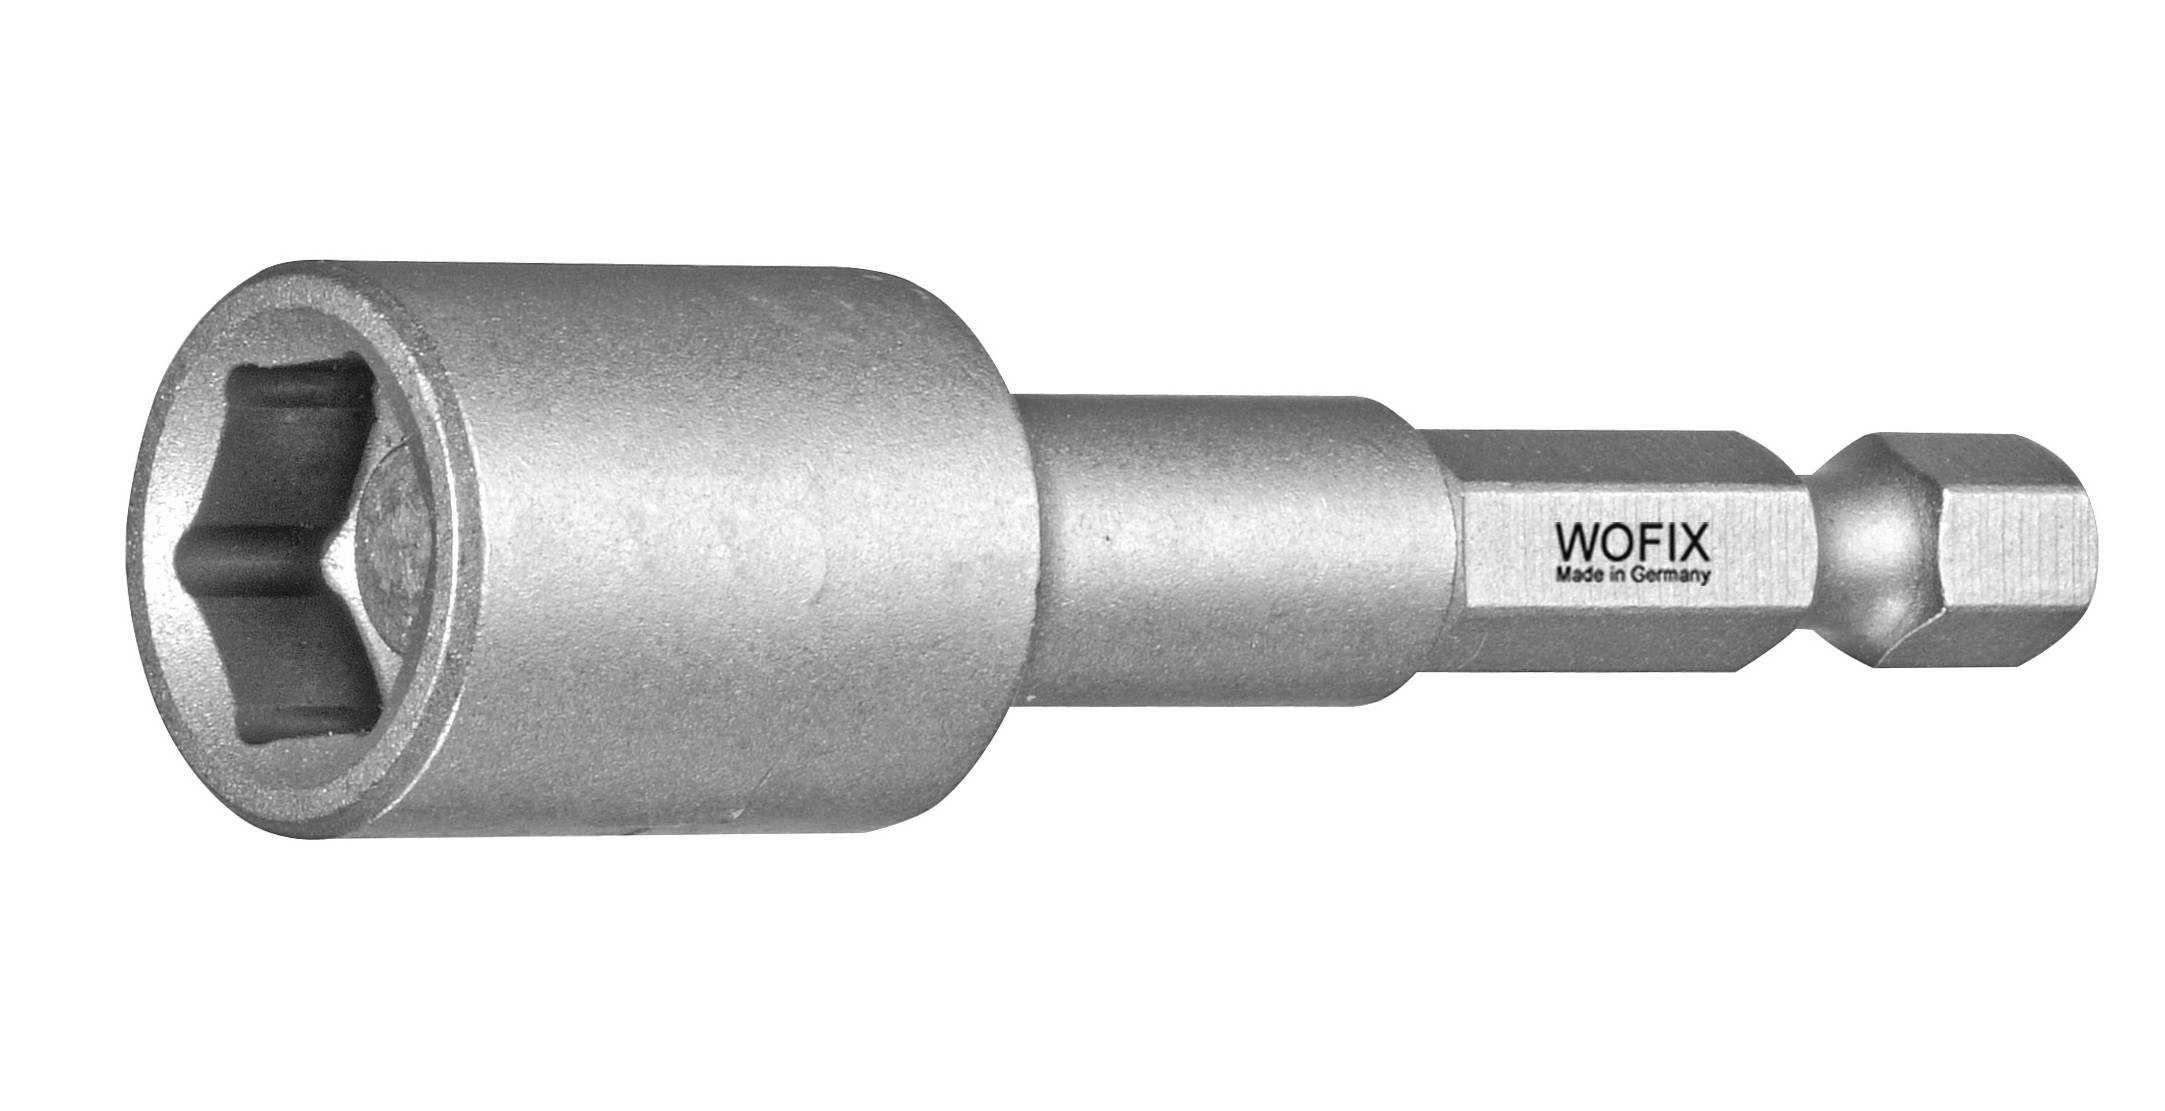 Wofix 7358055 Professional standard Dopbit - SW5,5 50 mm